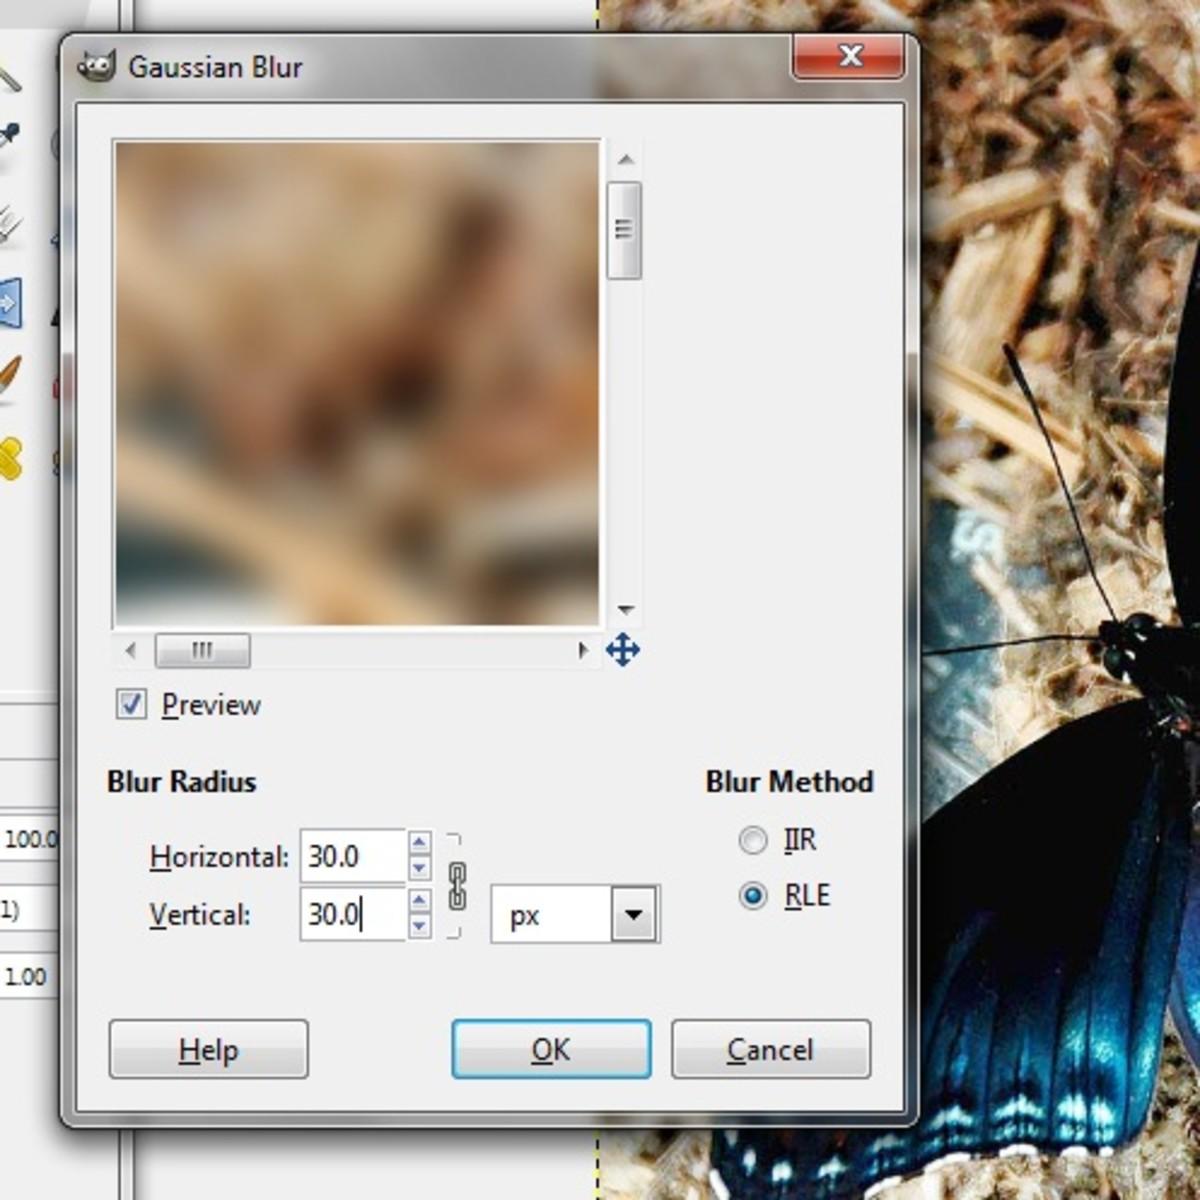 Set the Blur Radius and Method